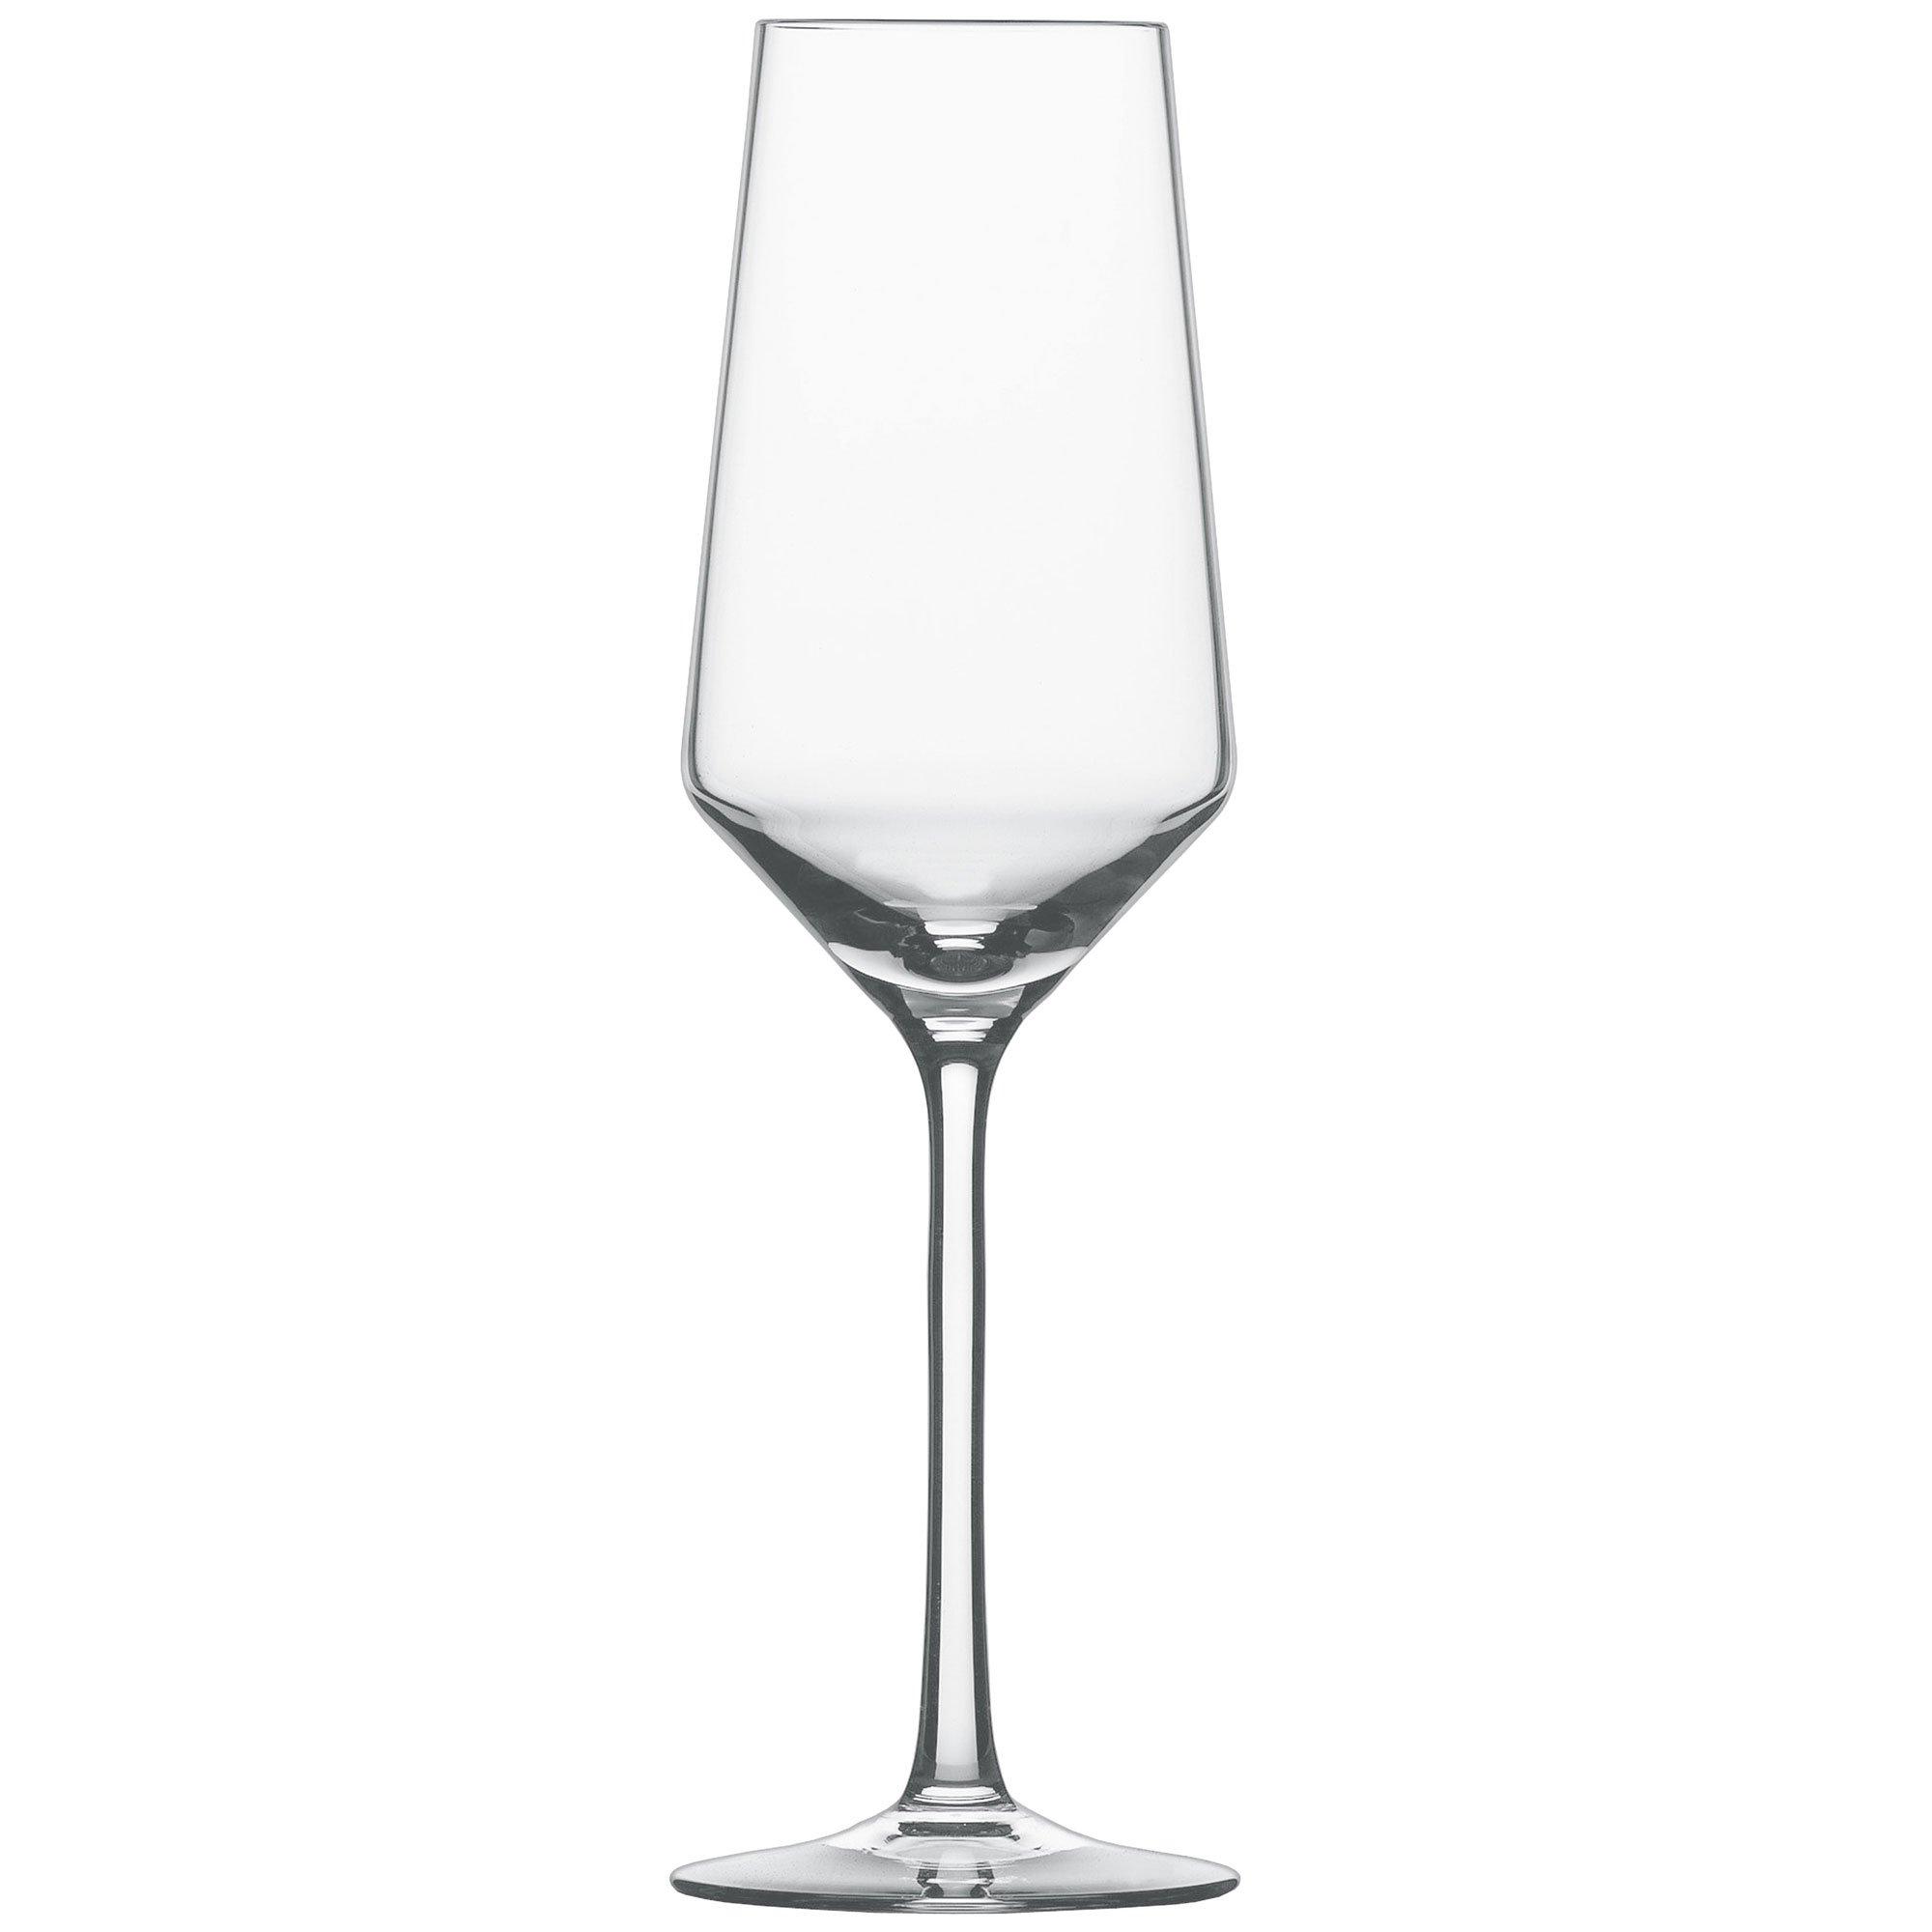 Shot Zwiesel PURE Pure champagne glass 297cc 30018 6 -legged set 0949529 by Schott Zwiesel (Image #1)